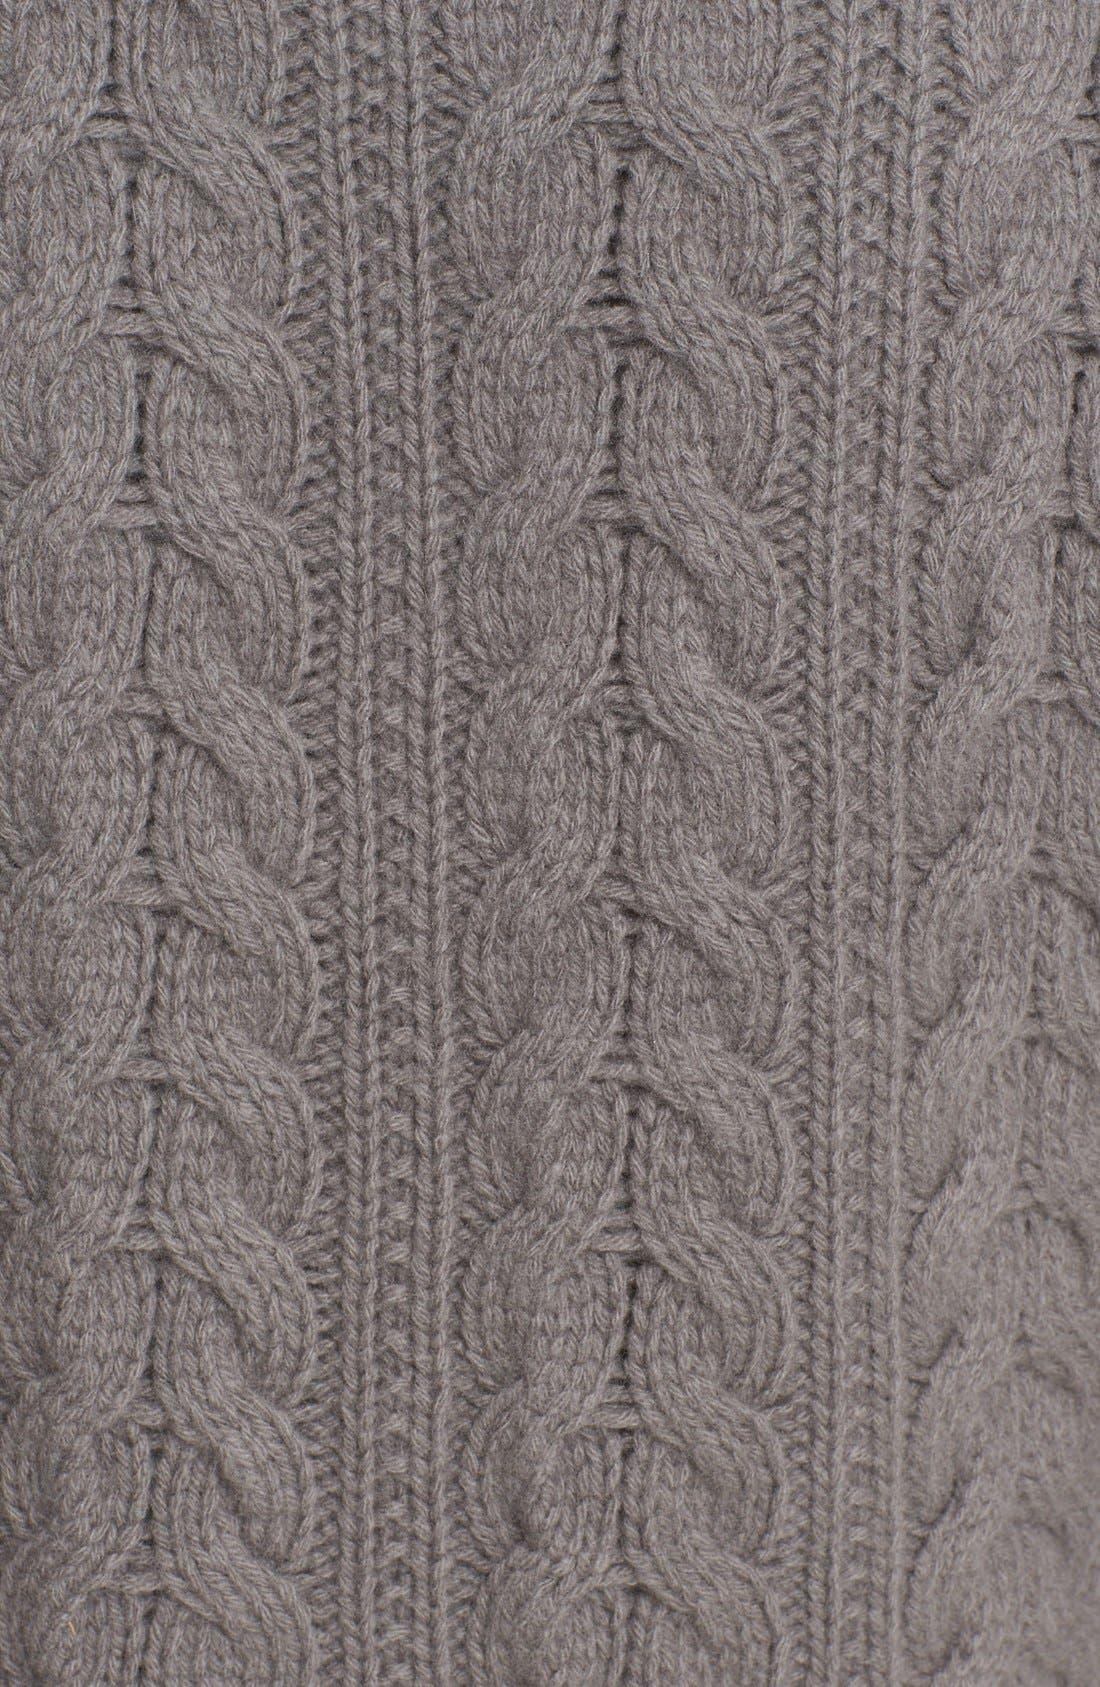 Genuine Mink Fur Vest with Cable Knit Back,                             Alternate thumbnail 3, color,                             078